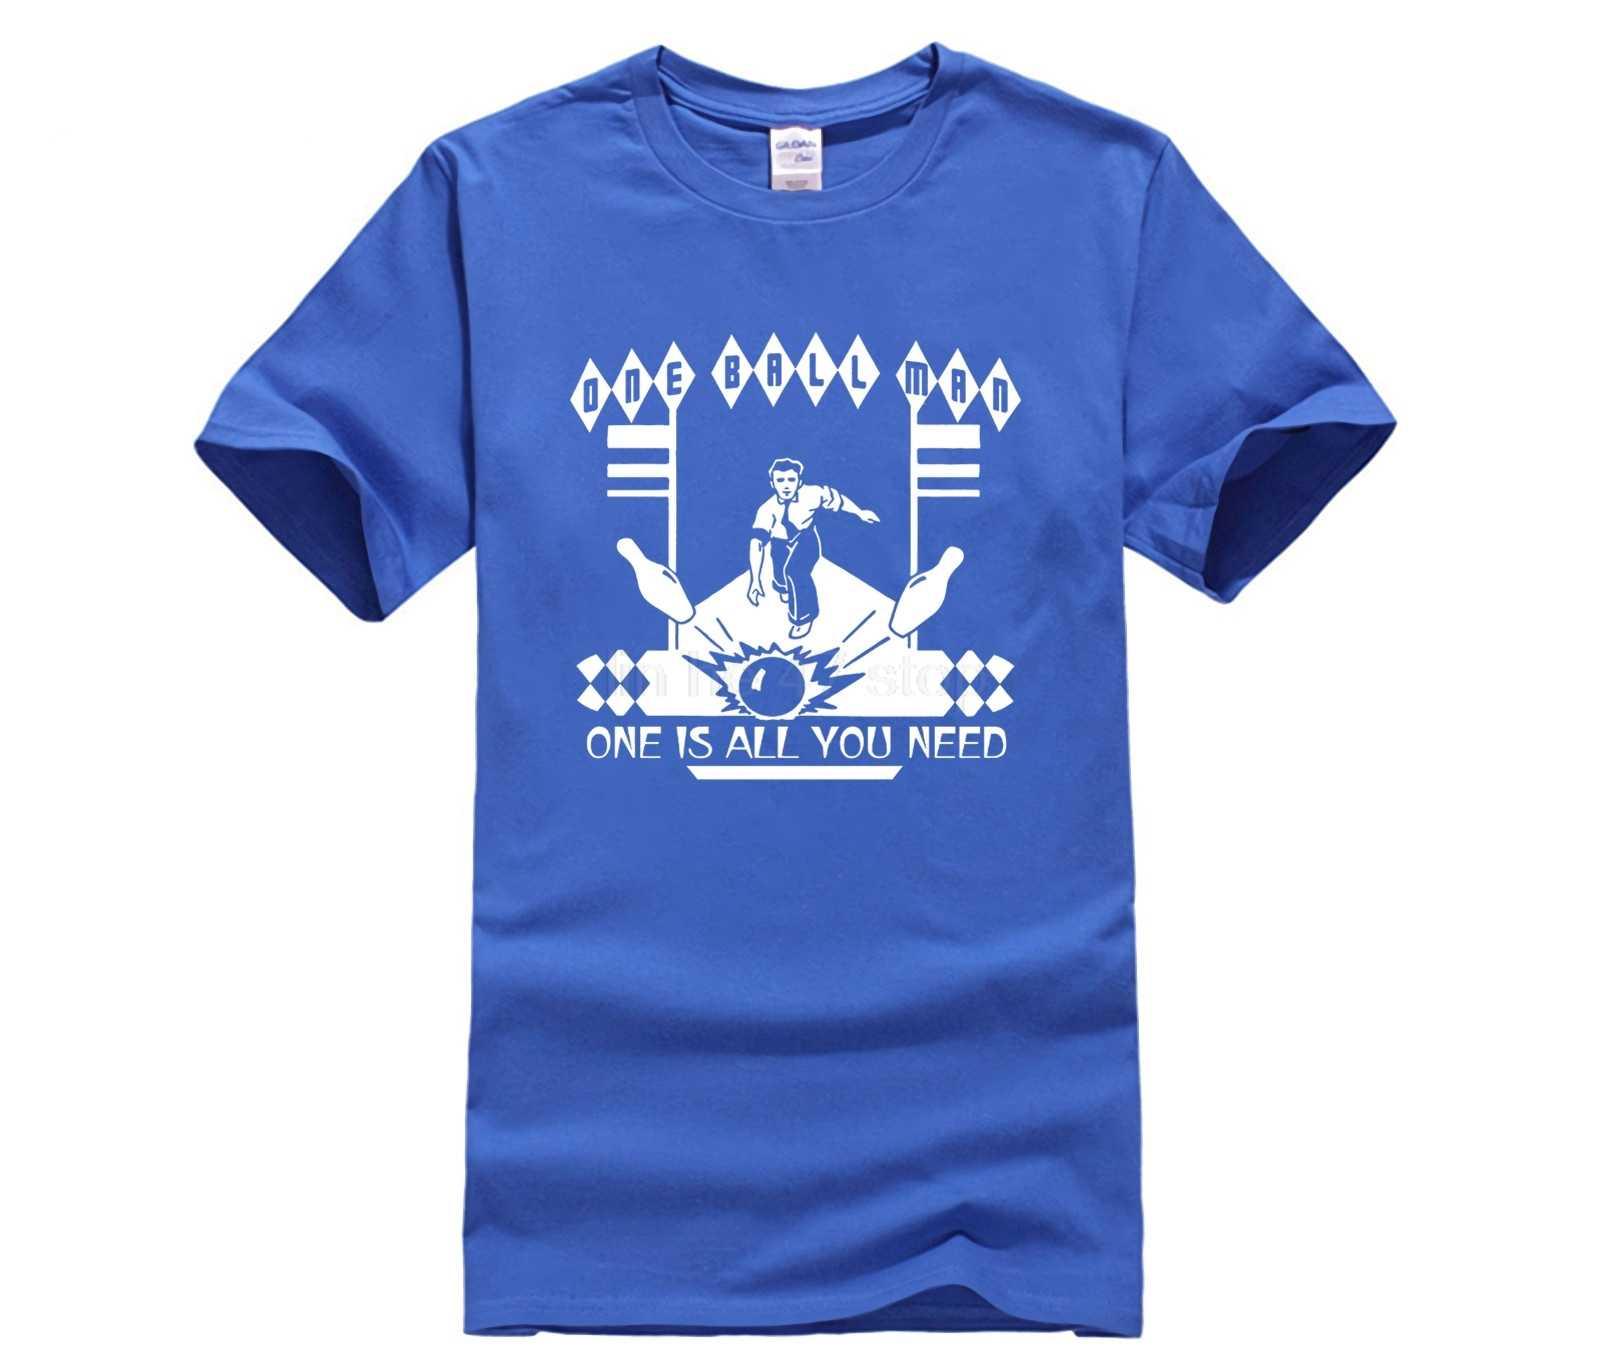 e3eac626dccd ... 2019 latest popular men's casual T-shirt Funny Testicular Cancer  Survivor T Shirt Fashion T ...